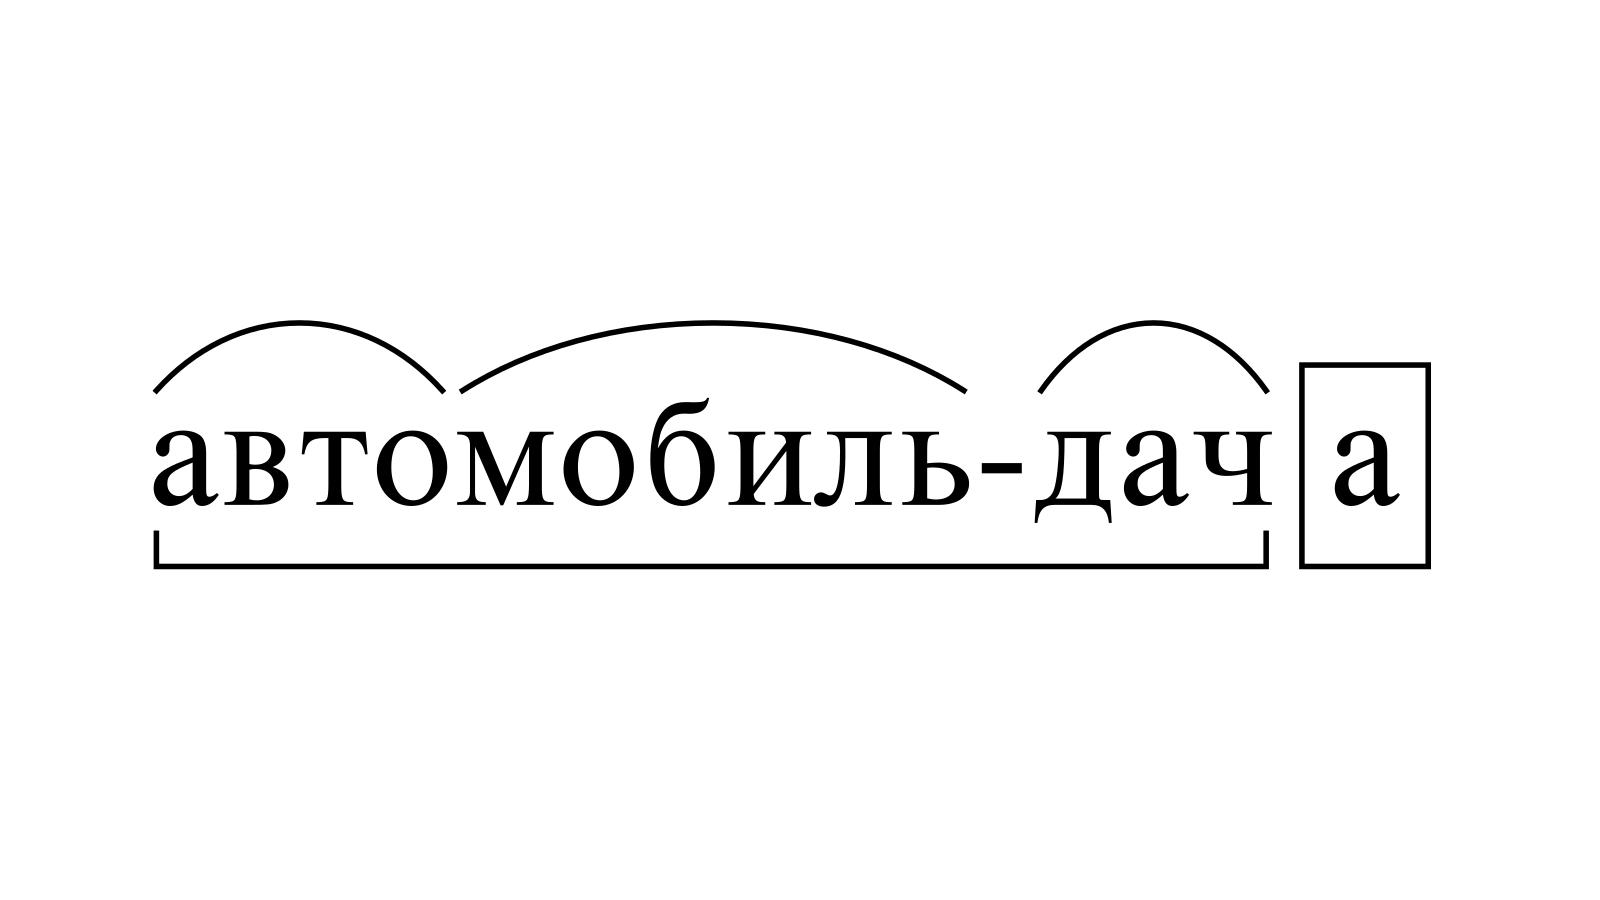 Разбор слова «автомобиль-дача» по составу